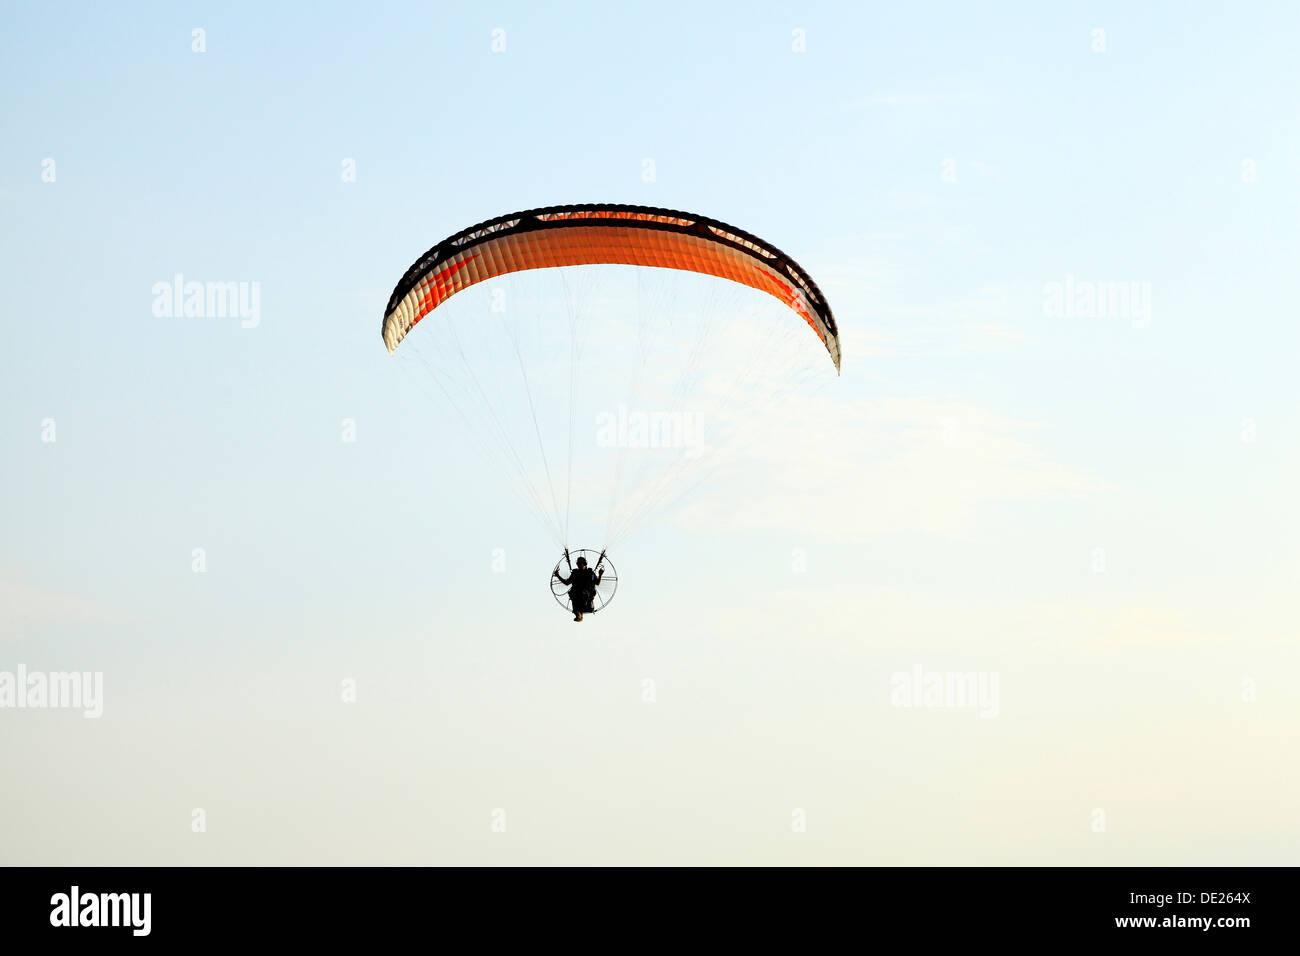 Hang Glider man hang gliding flying parachute leisure activity UK gliders - Stock Image